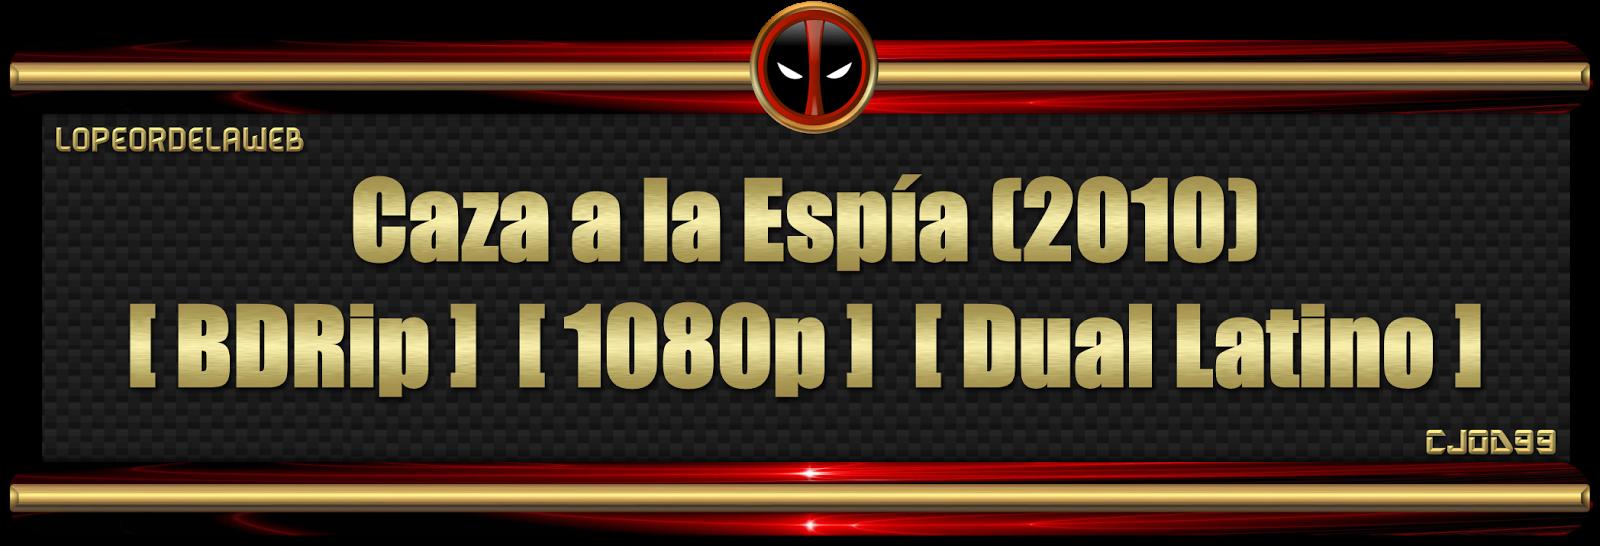 Caza a la Espia (2010)[BDRip][1080p][Dual Latino]